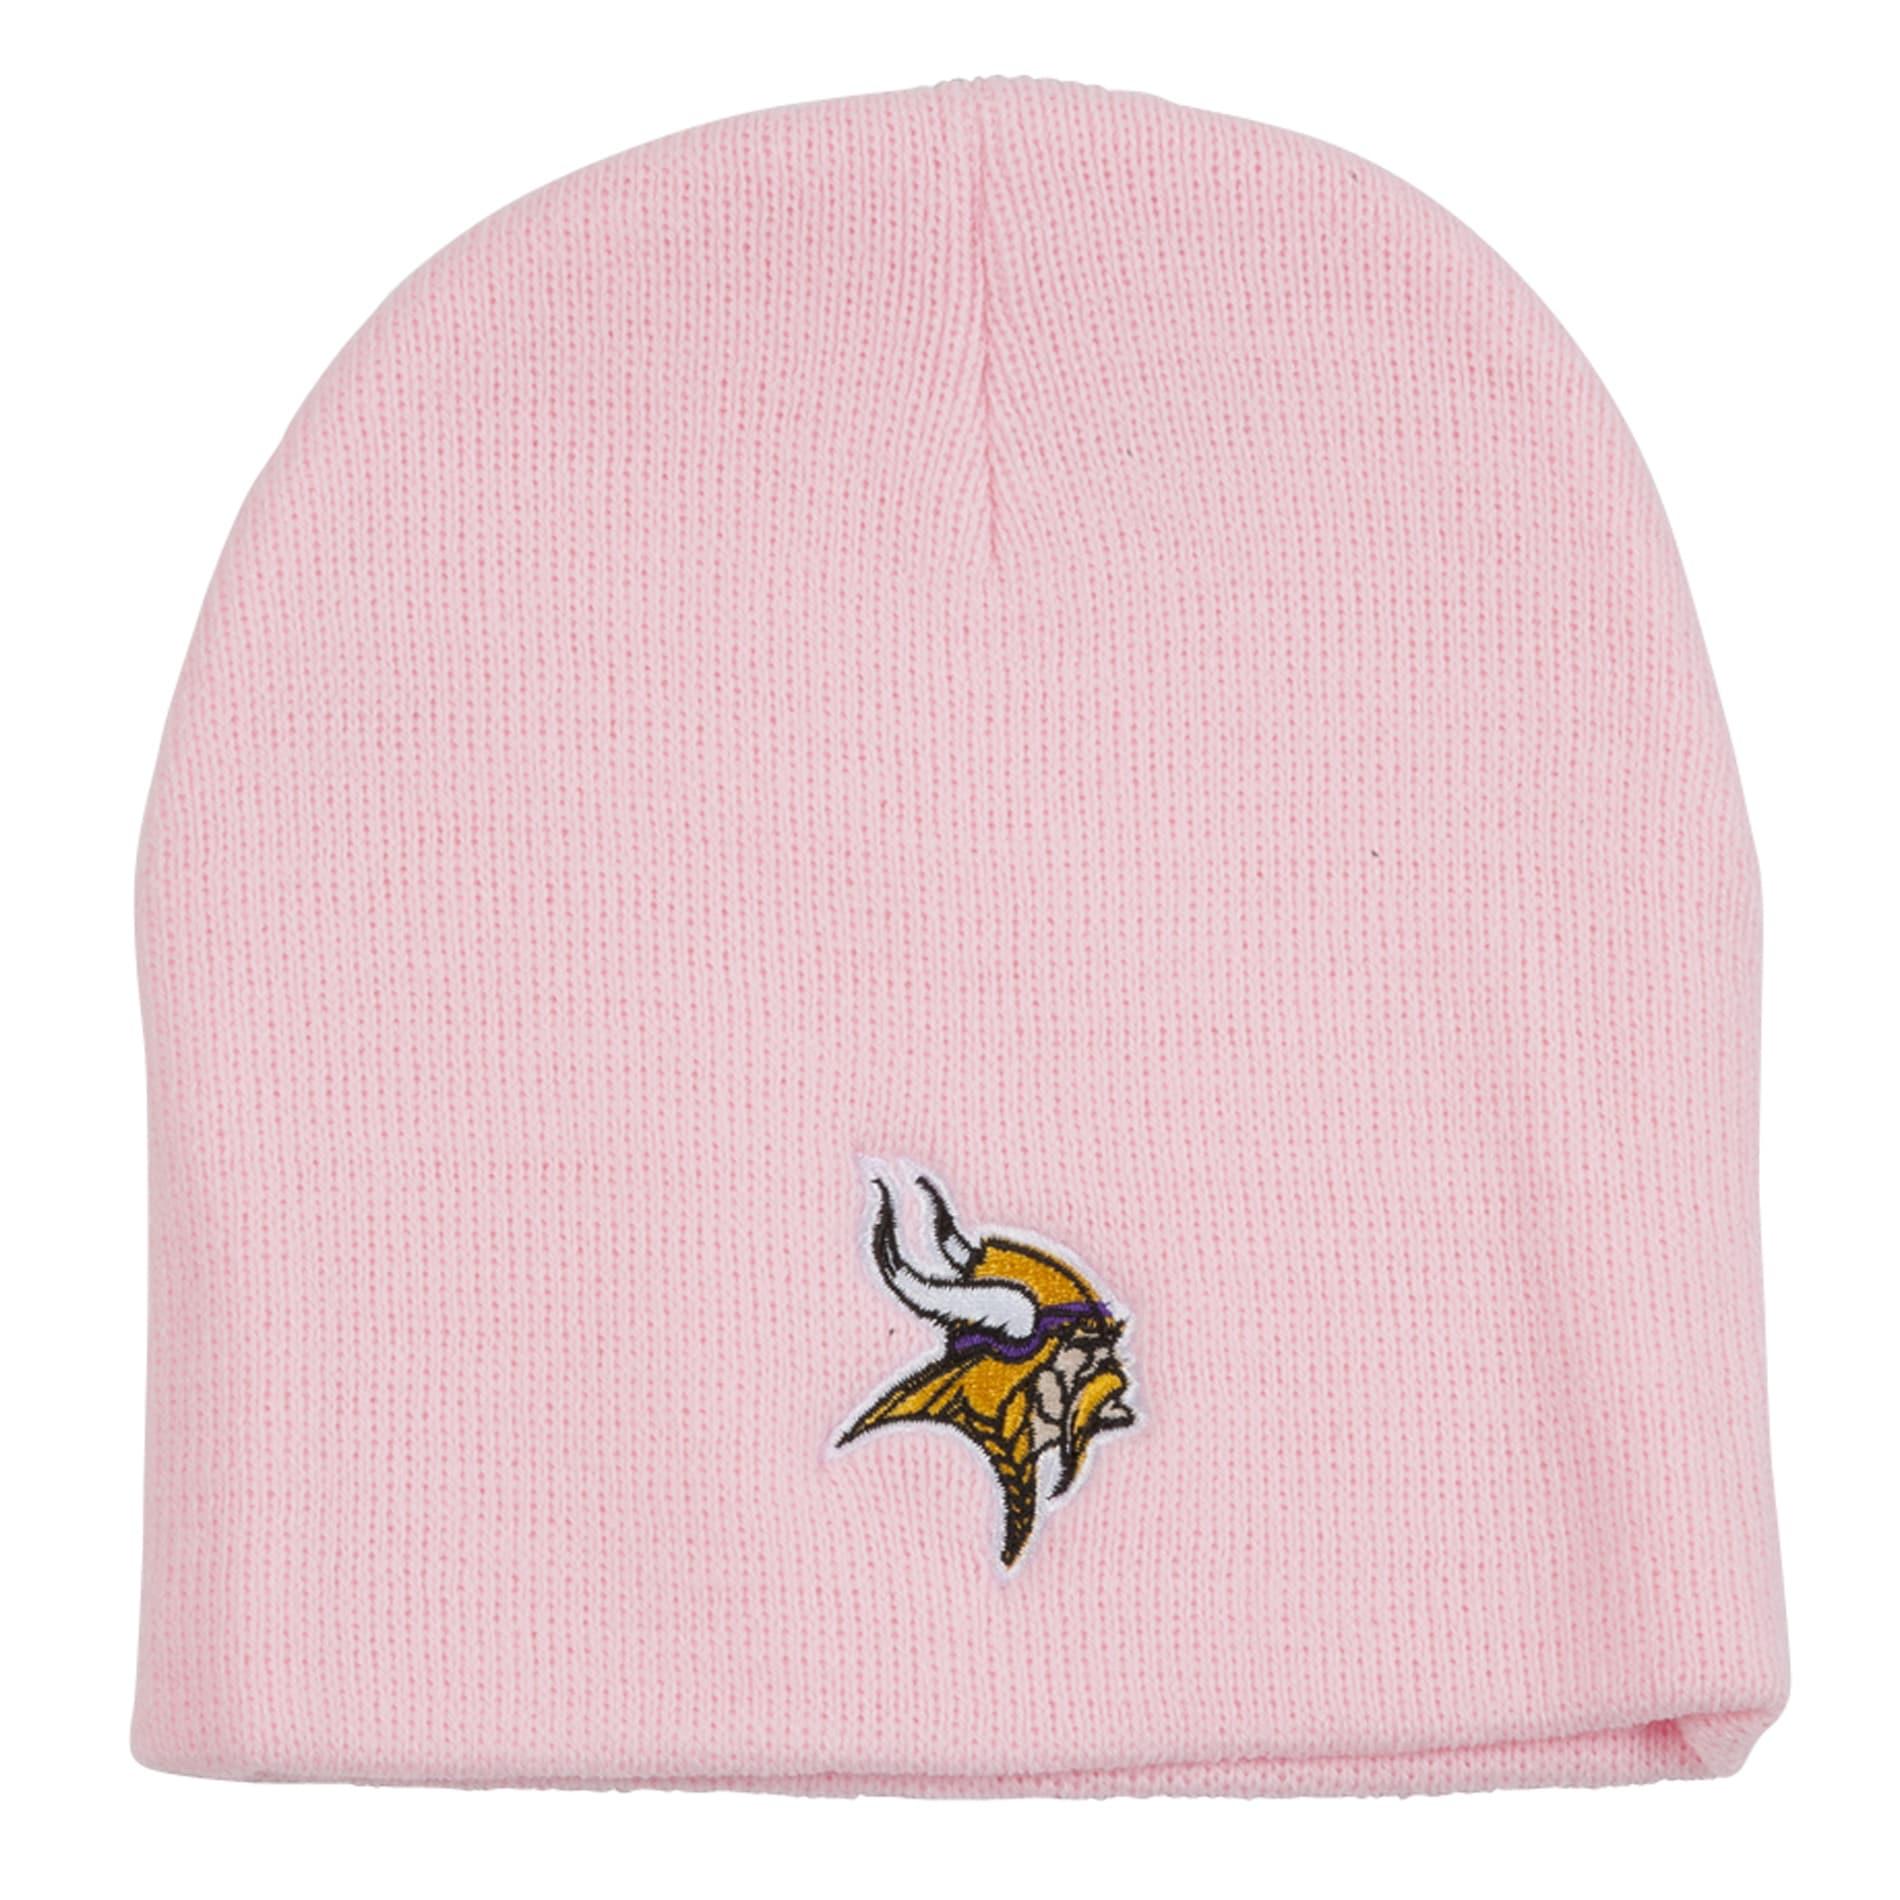 Broncos Stocking Hat: Shop Minnesota Vikings Pink Beanie Stocking Hat